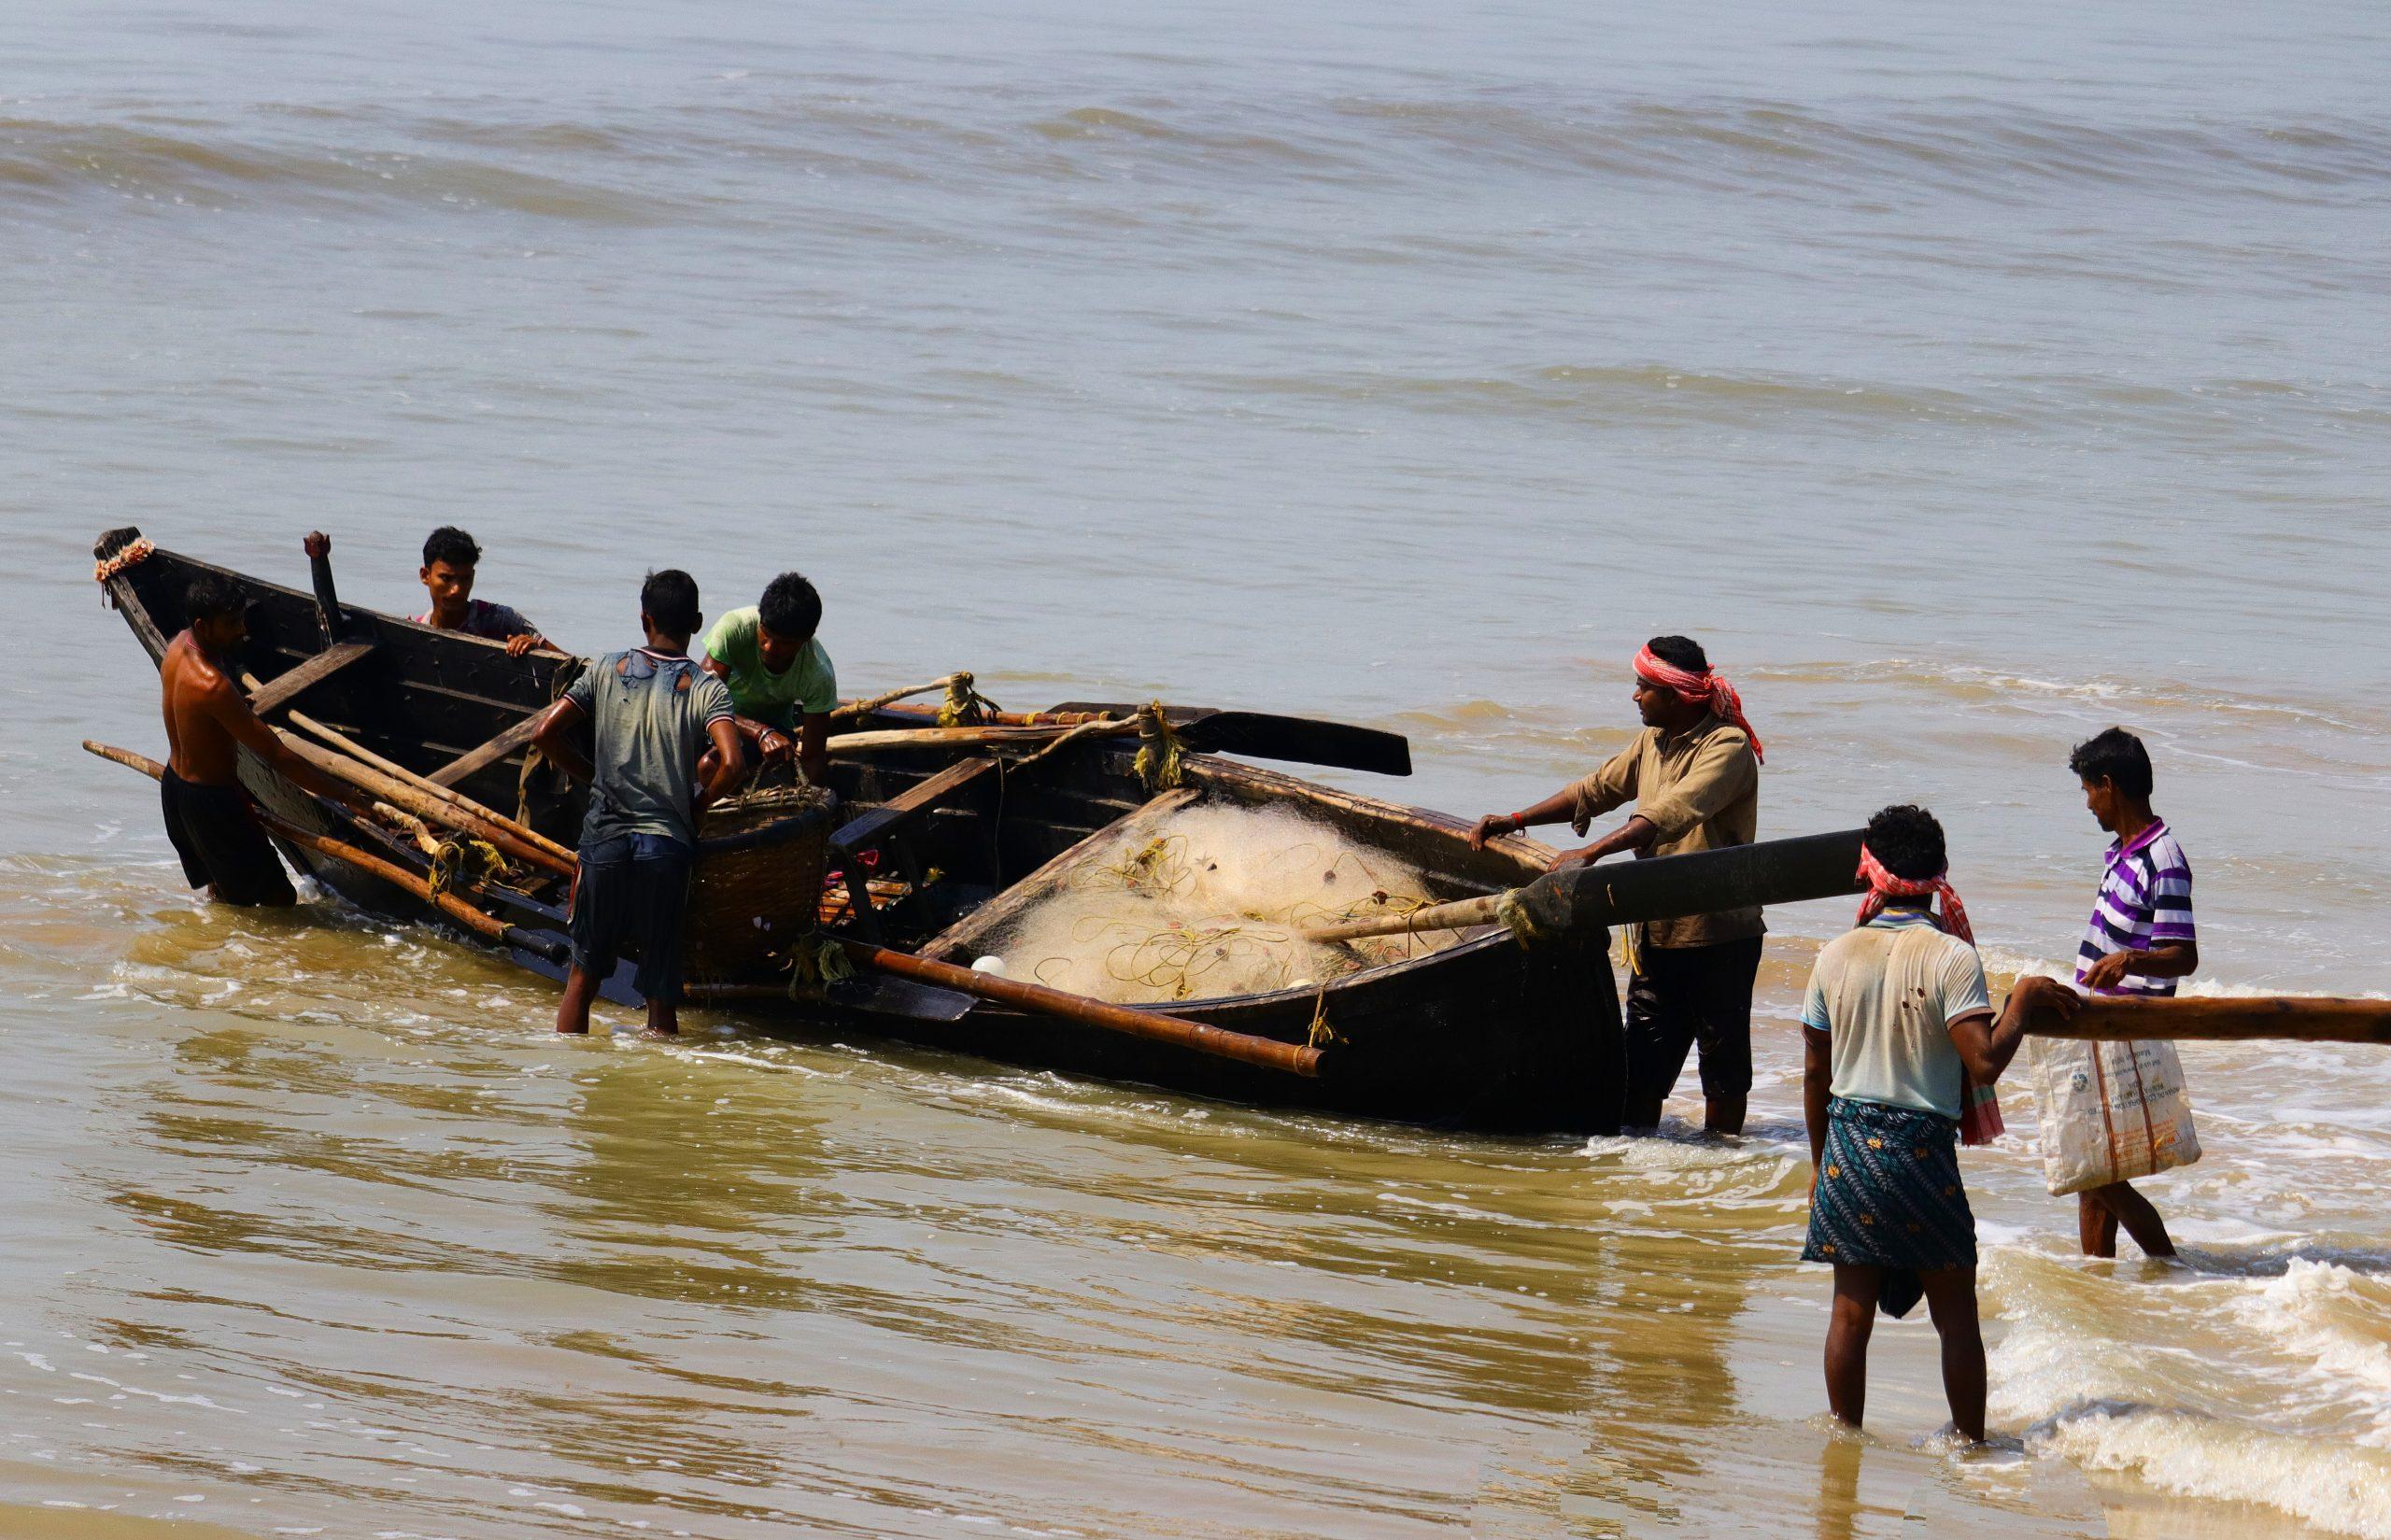 Fishermen getting their boat in water